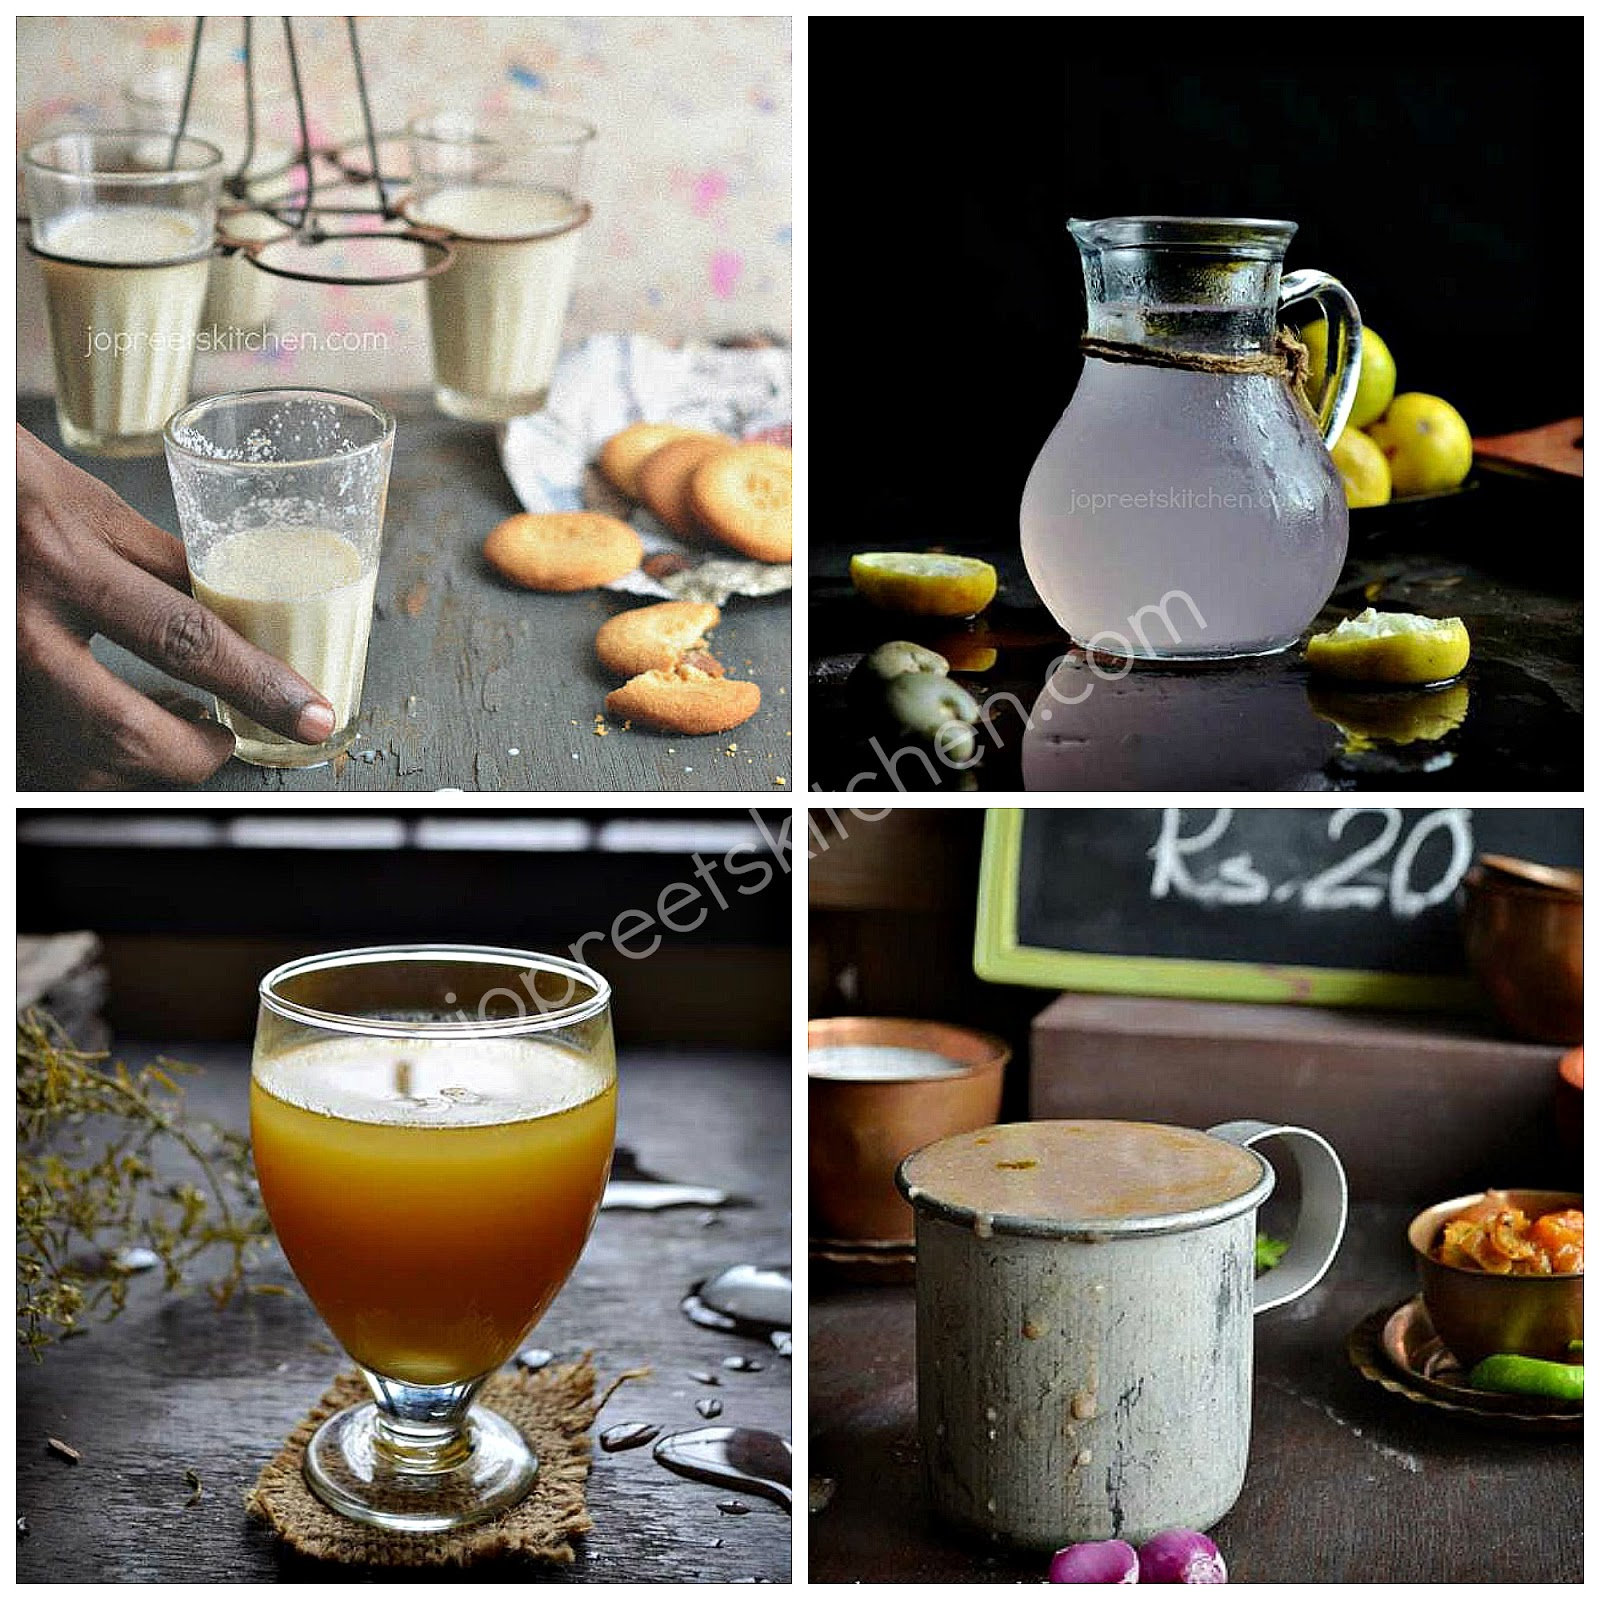 Summer Special Drinks (Juices, Sharbat, Milkshake & Smoothies)